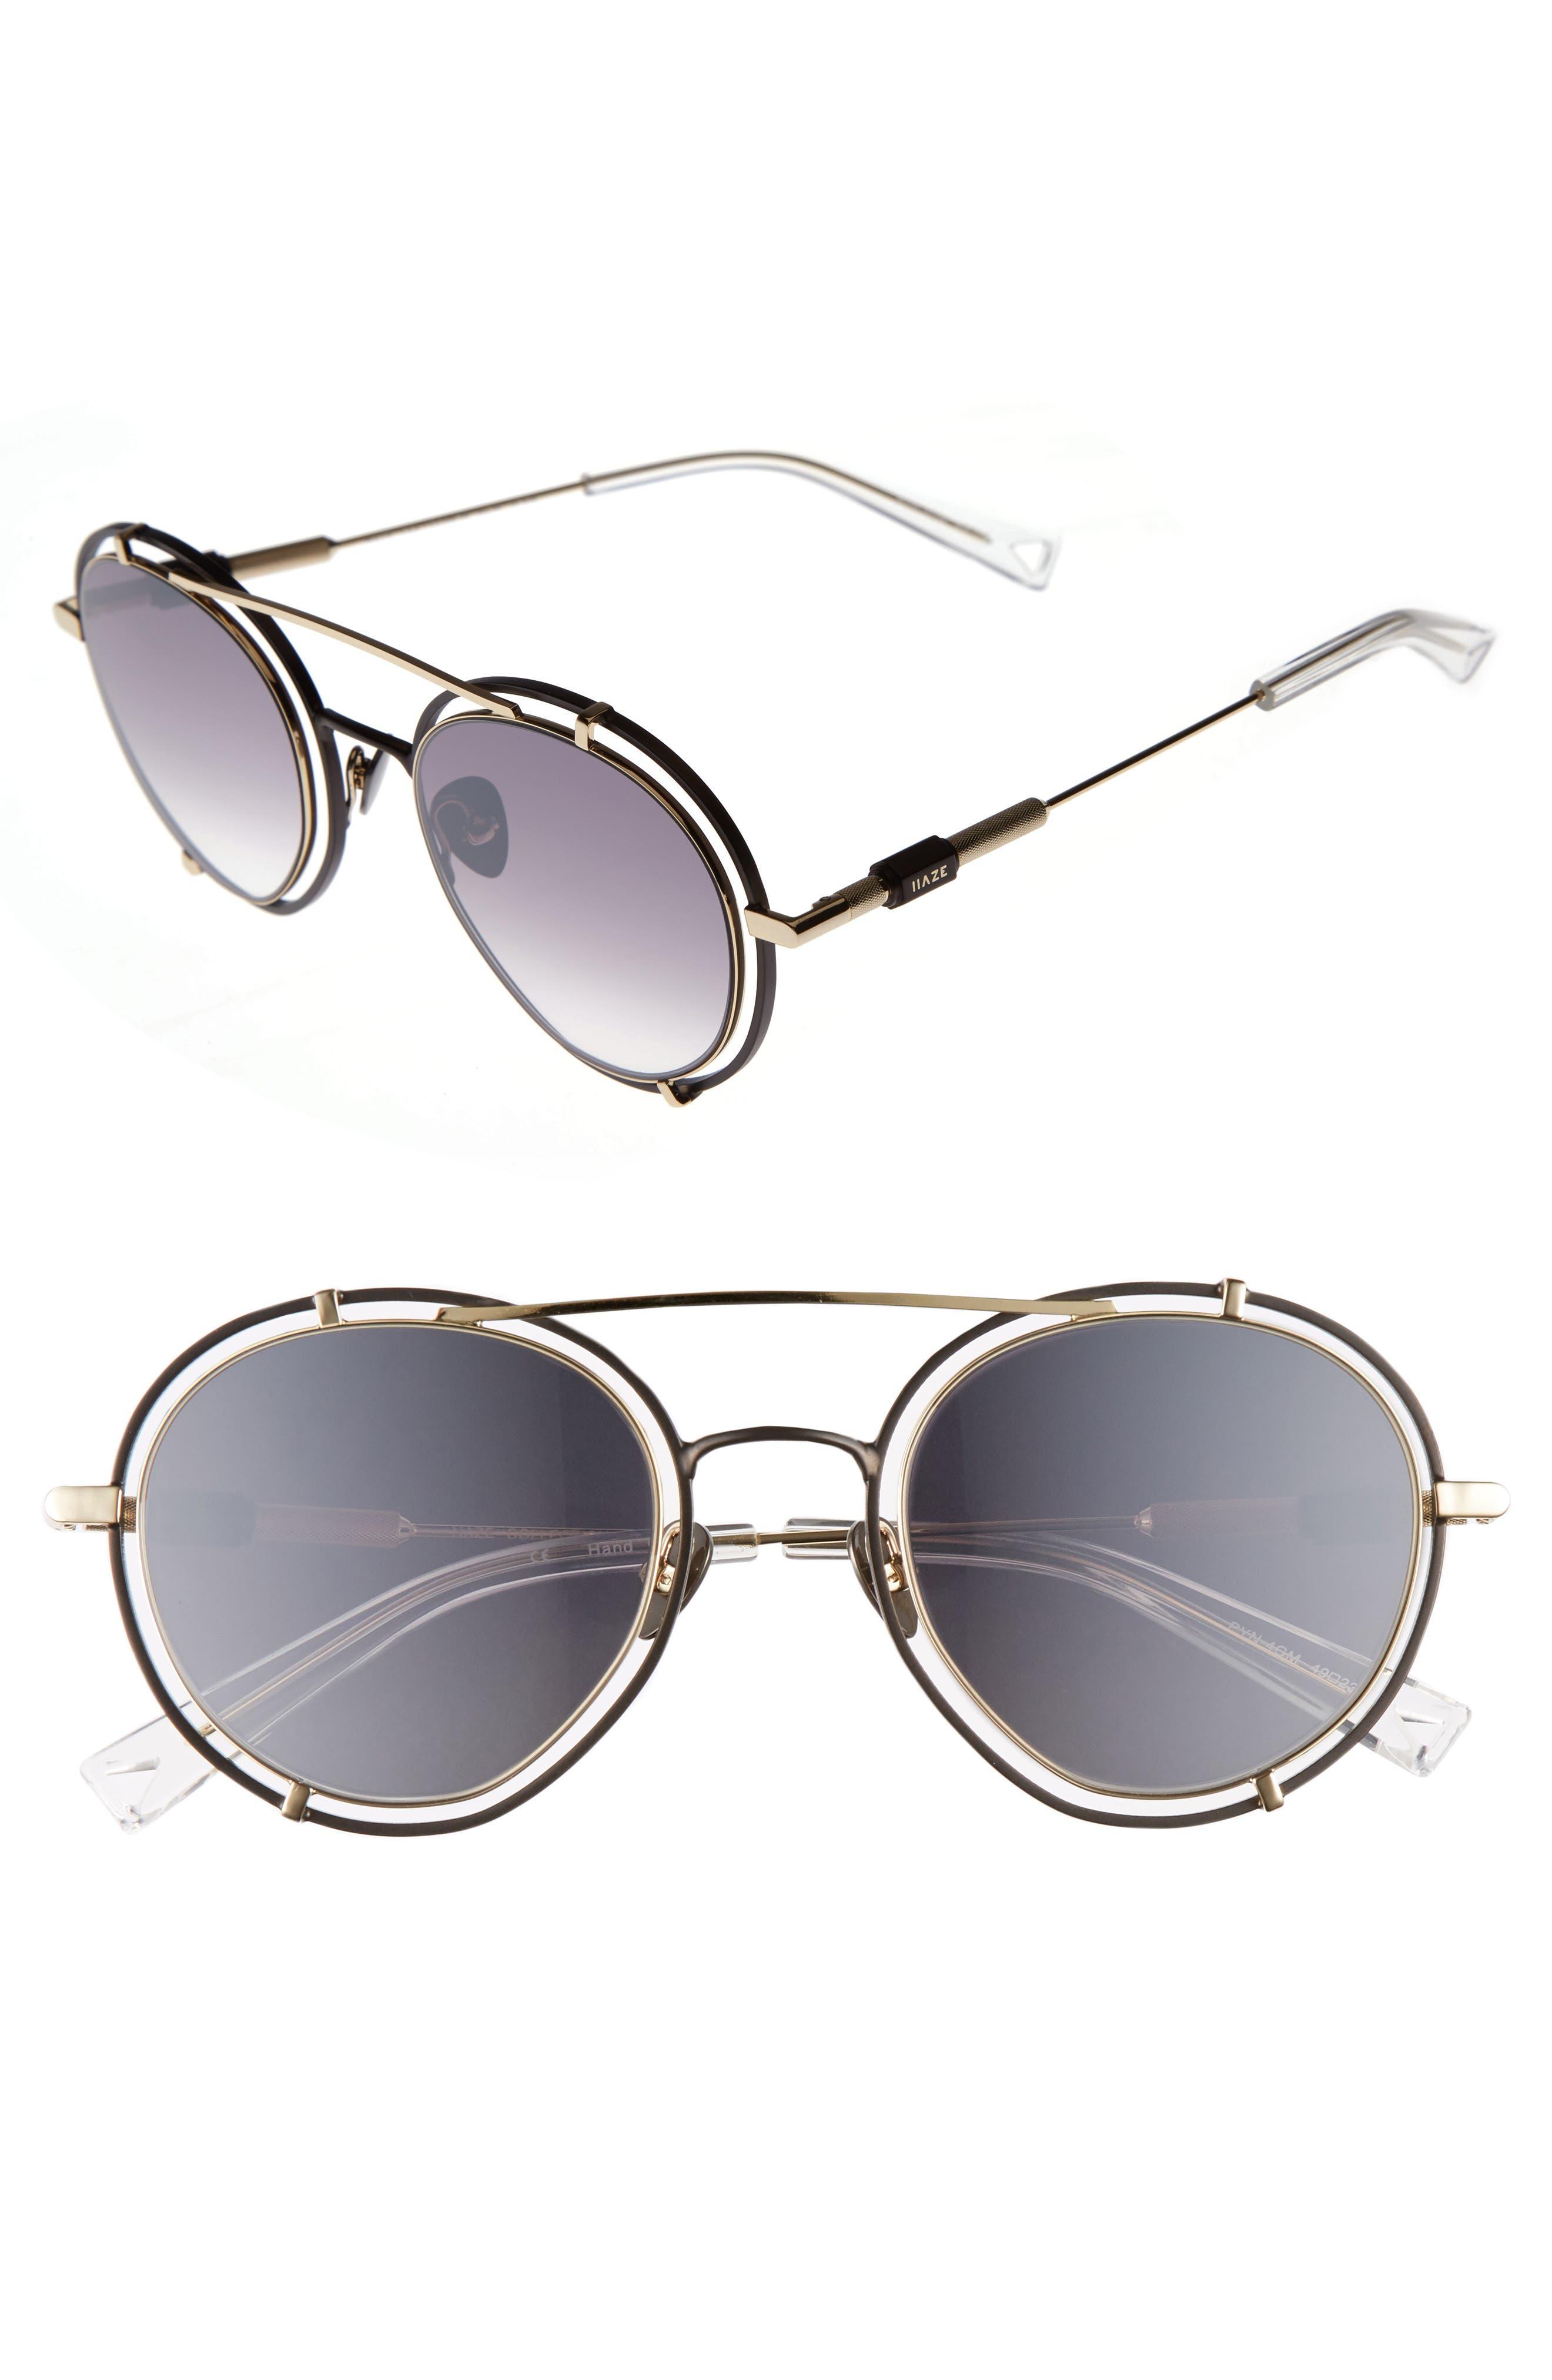 HAZE Pyn 55mm Mirrored Sunglasses